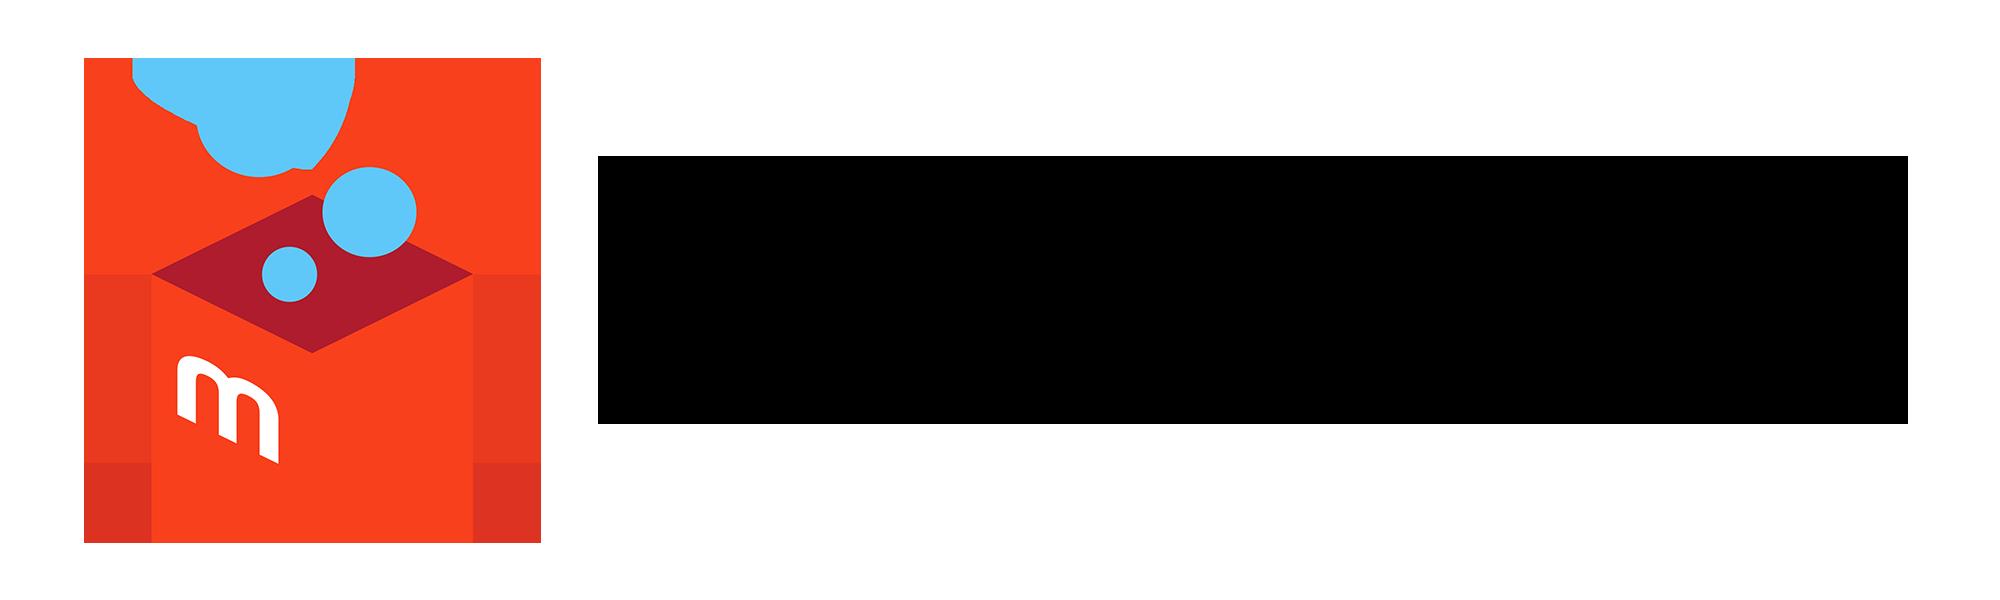 mercari-icon3_orig.png